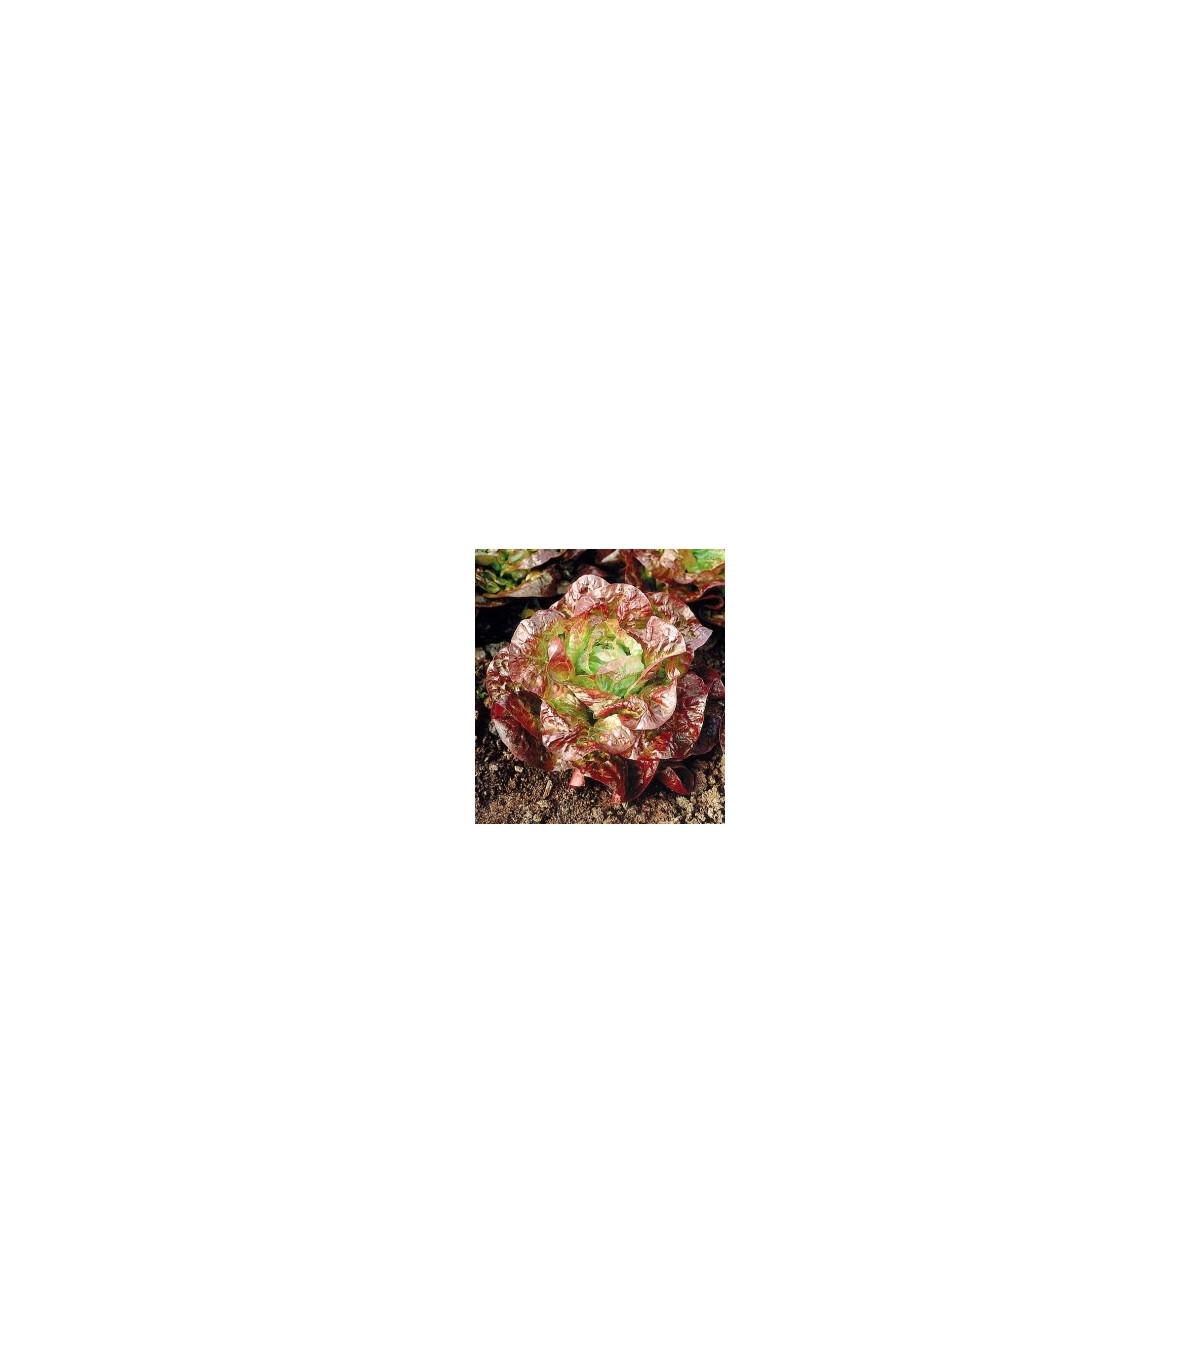 Salát hlávkoý červený - Latusa sativa - prodej semen salátu - 0,5 gr